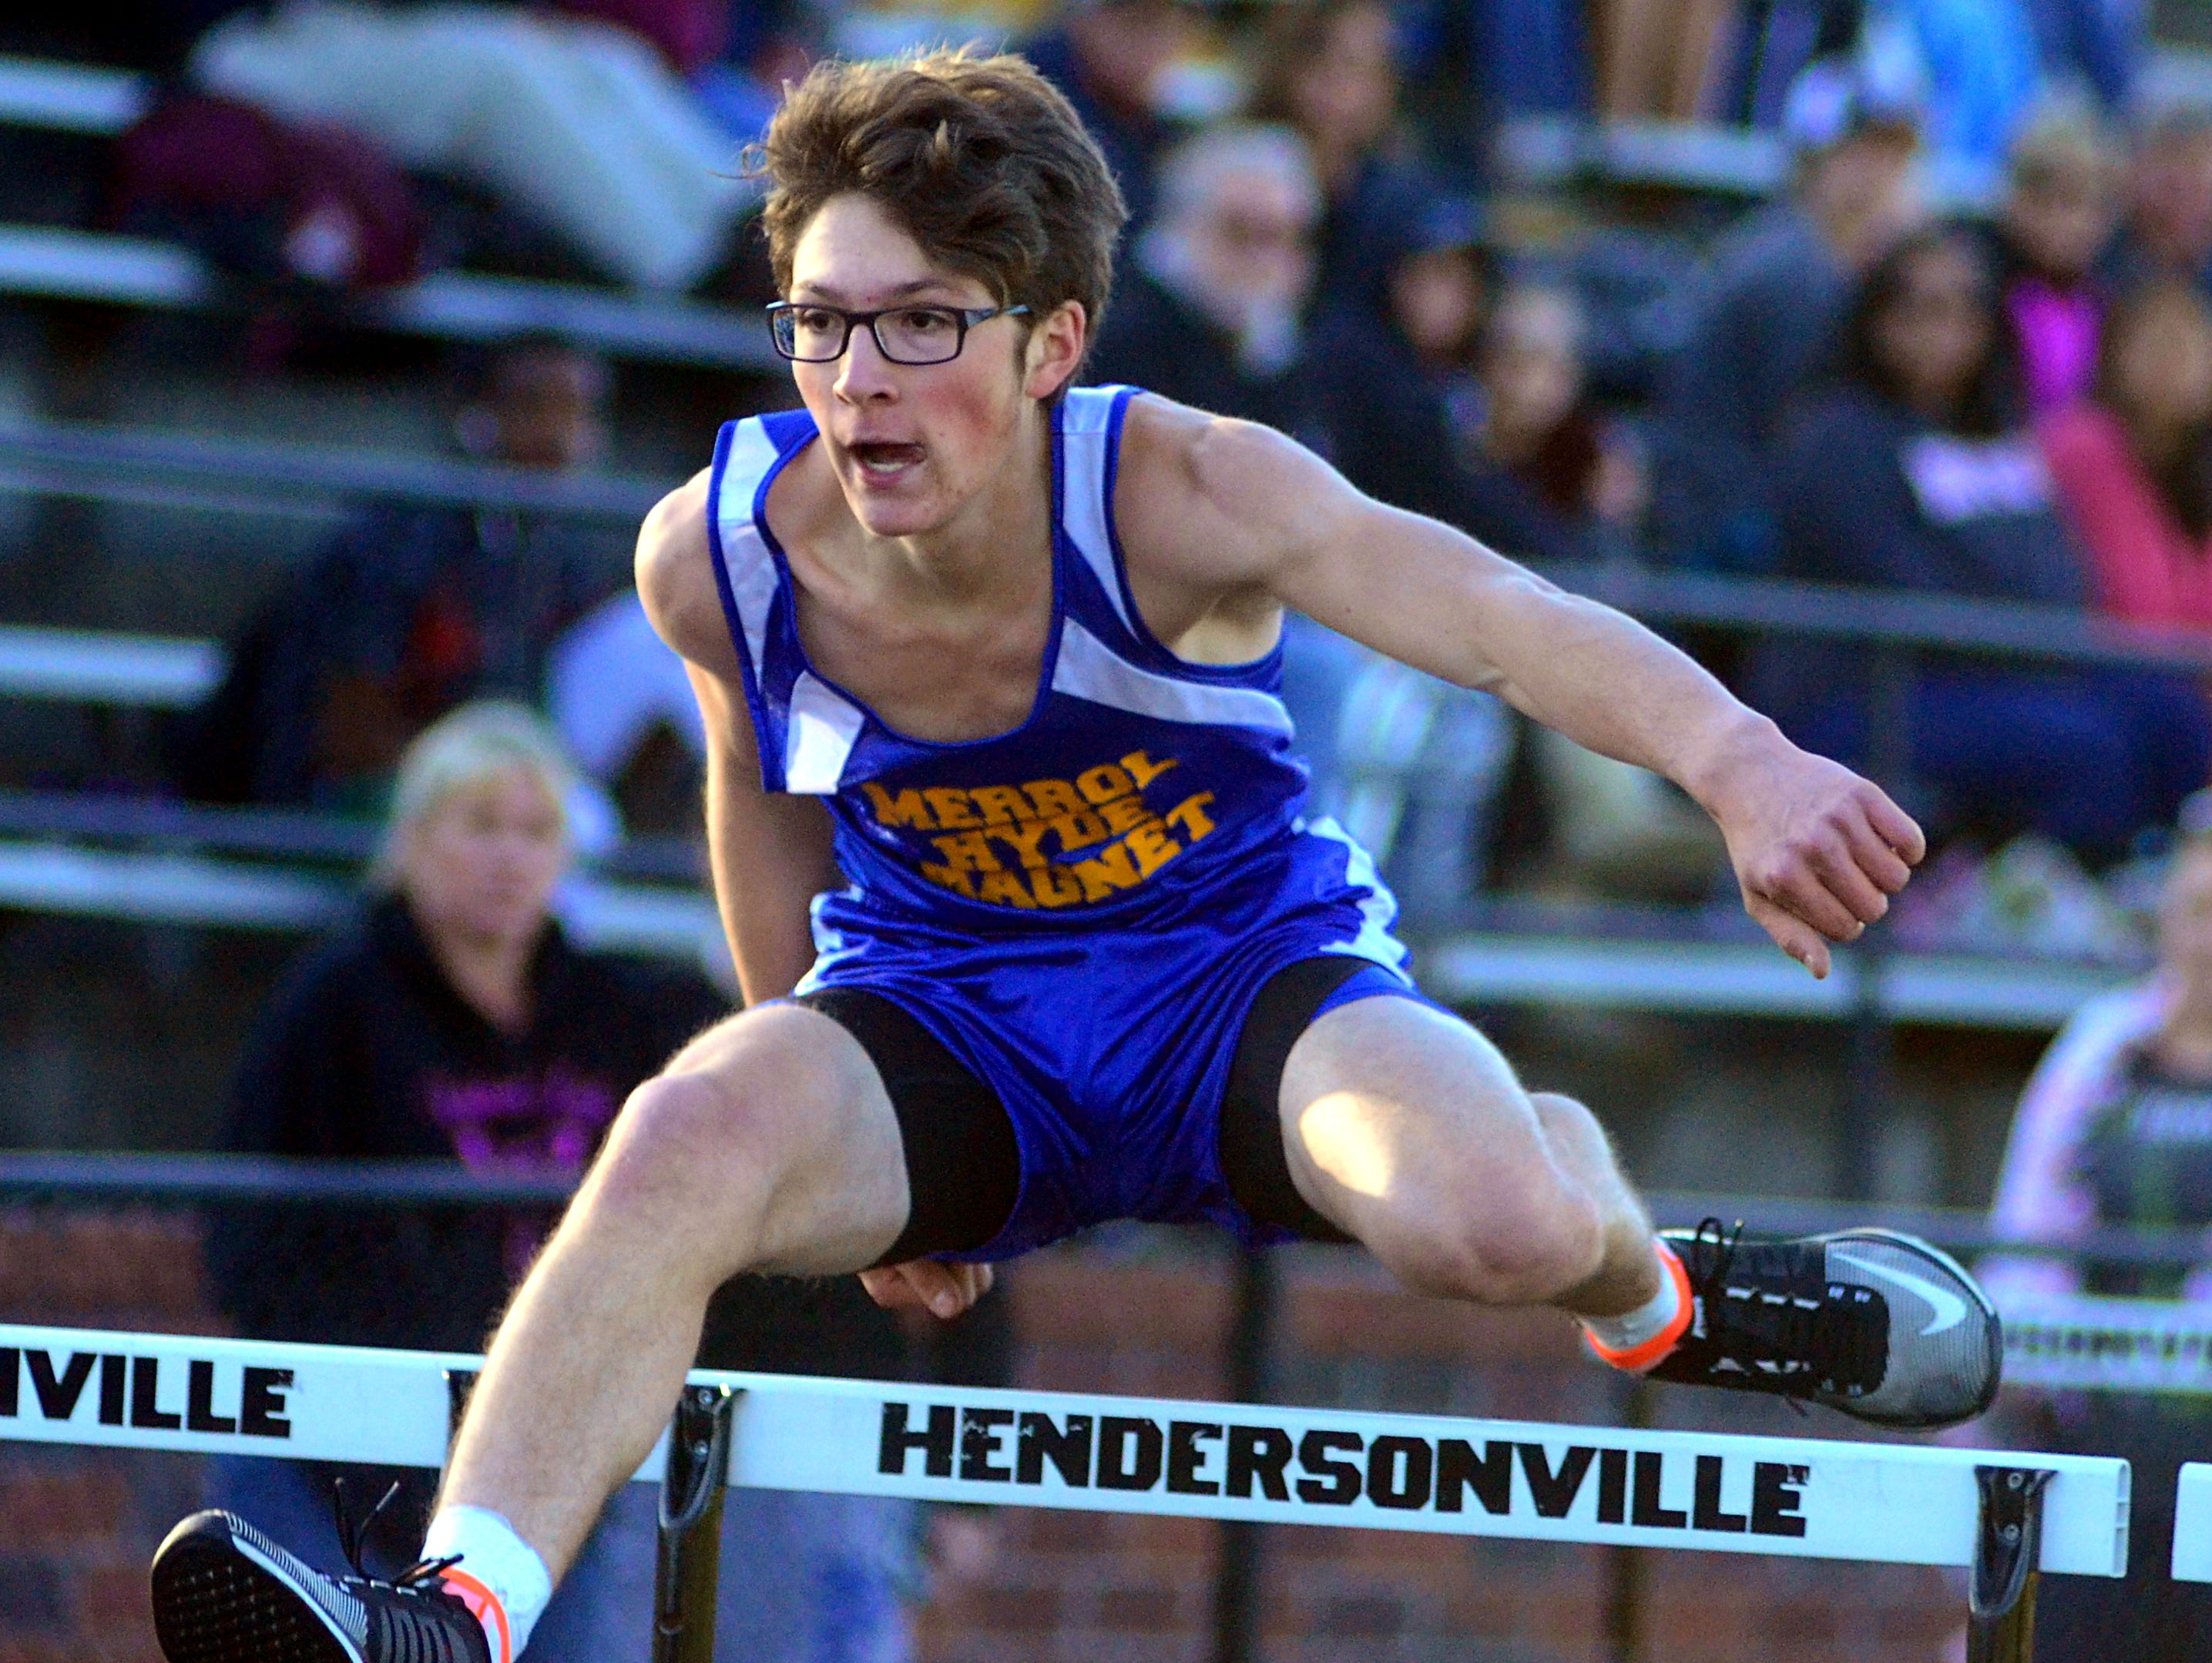 Merrol Hyde Magnet senior Carter Davidson posted the fastest qualifying time in the boys 110-meter hurdles.